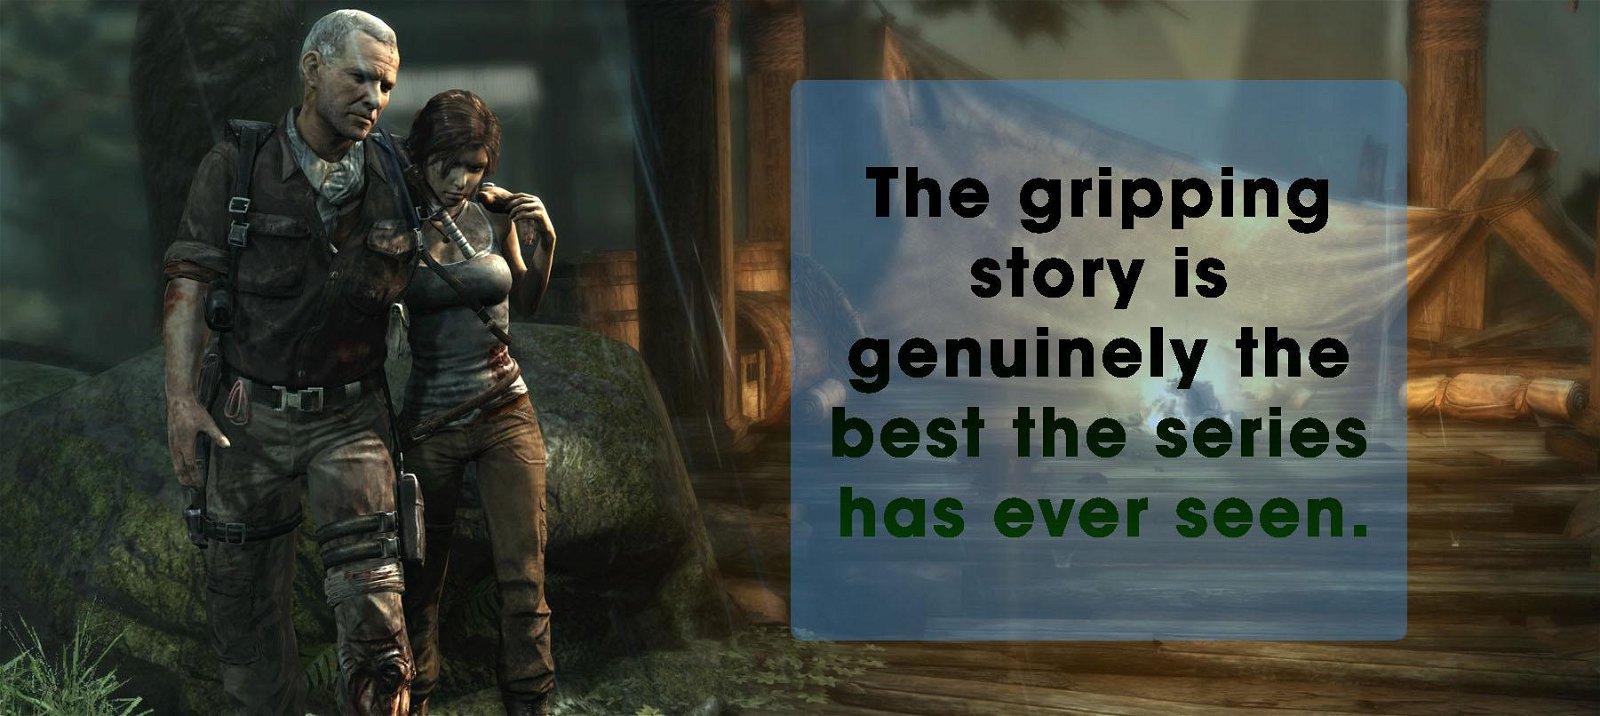 Laraandguytext.jpg